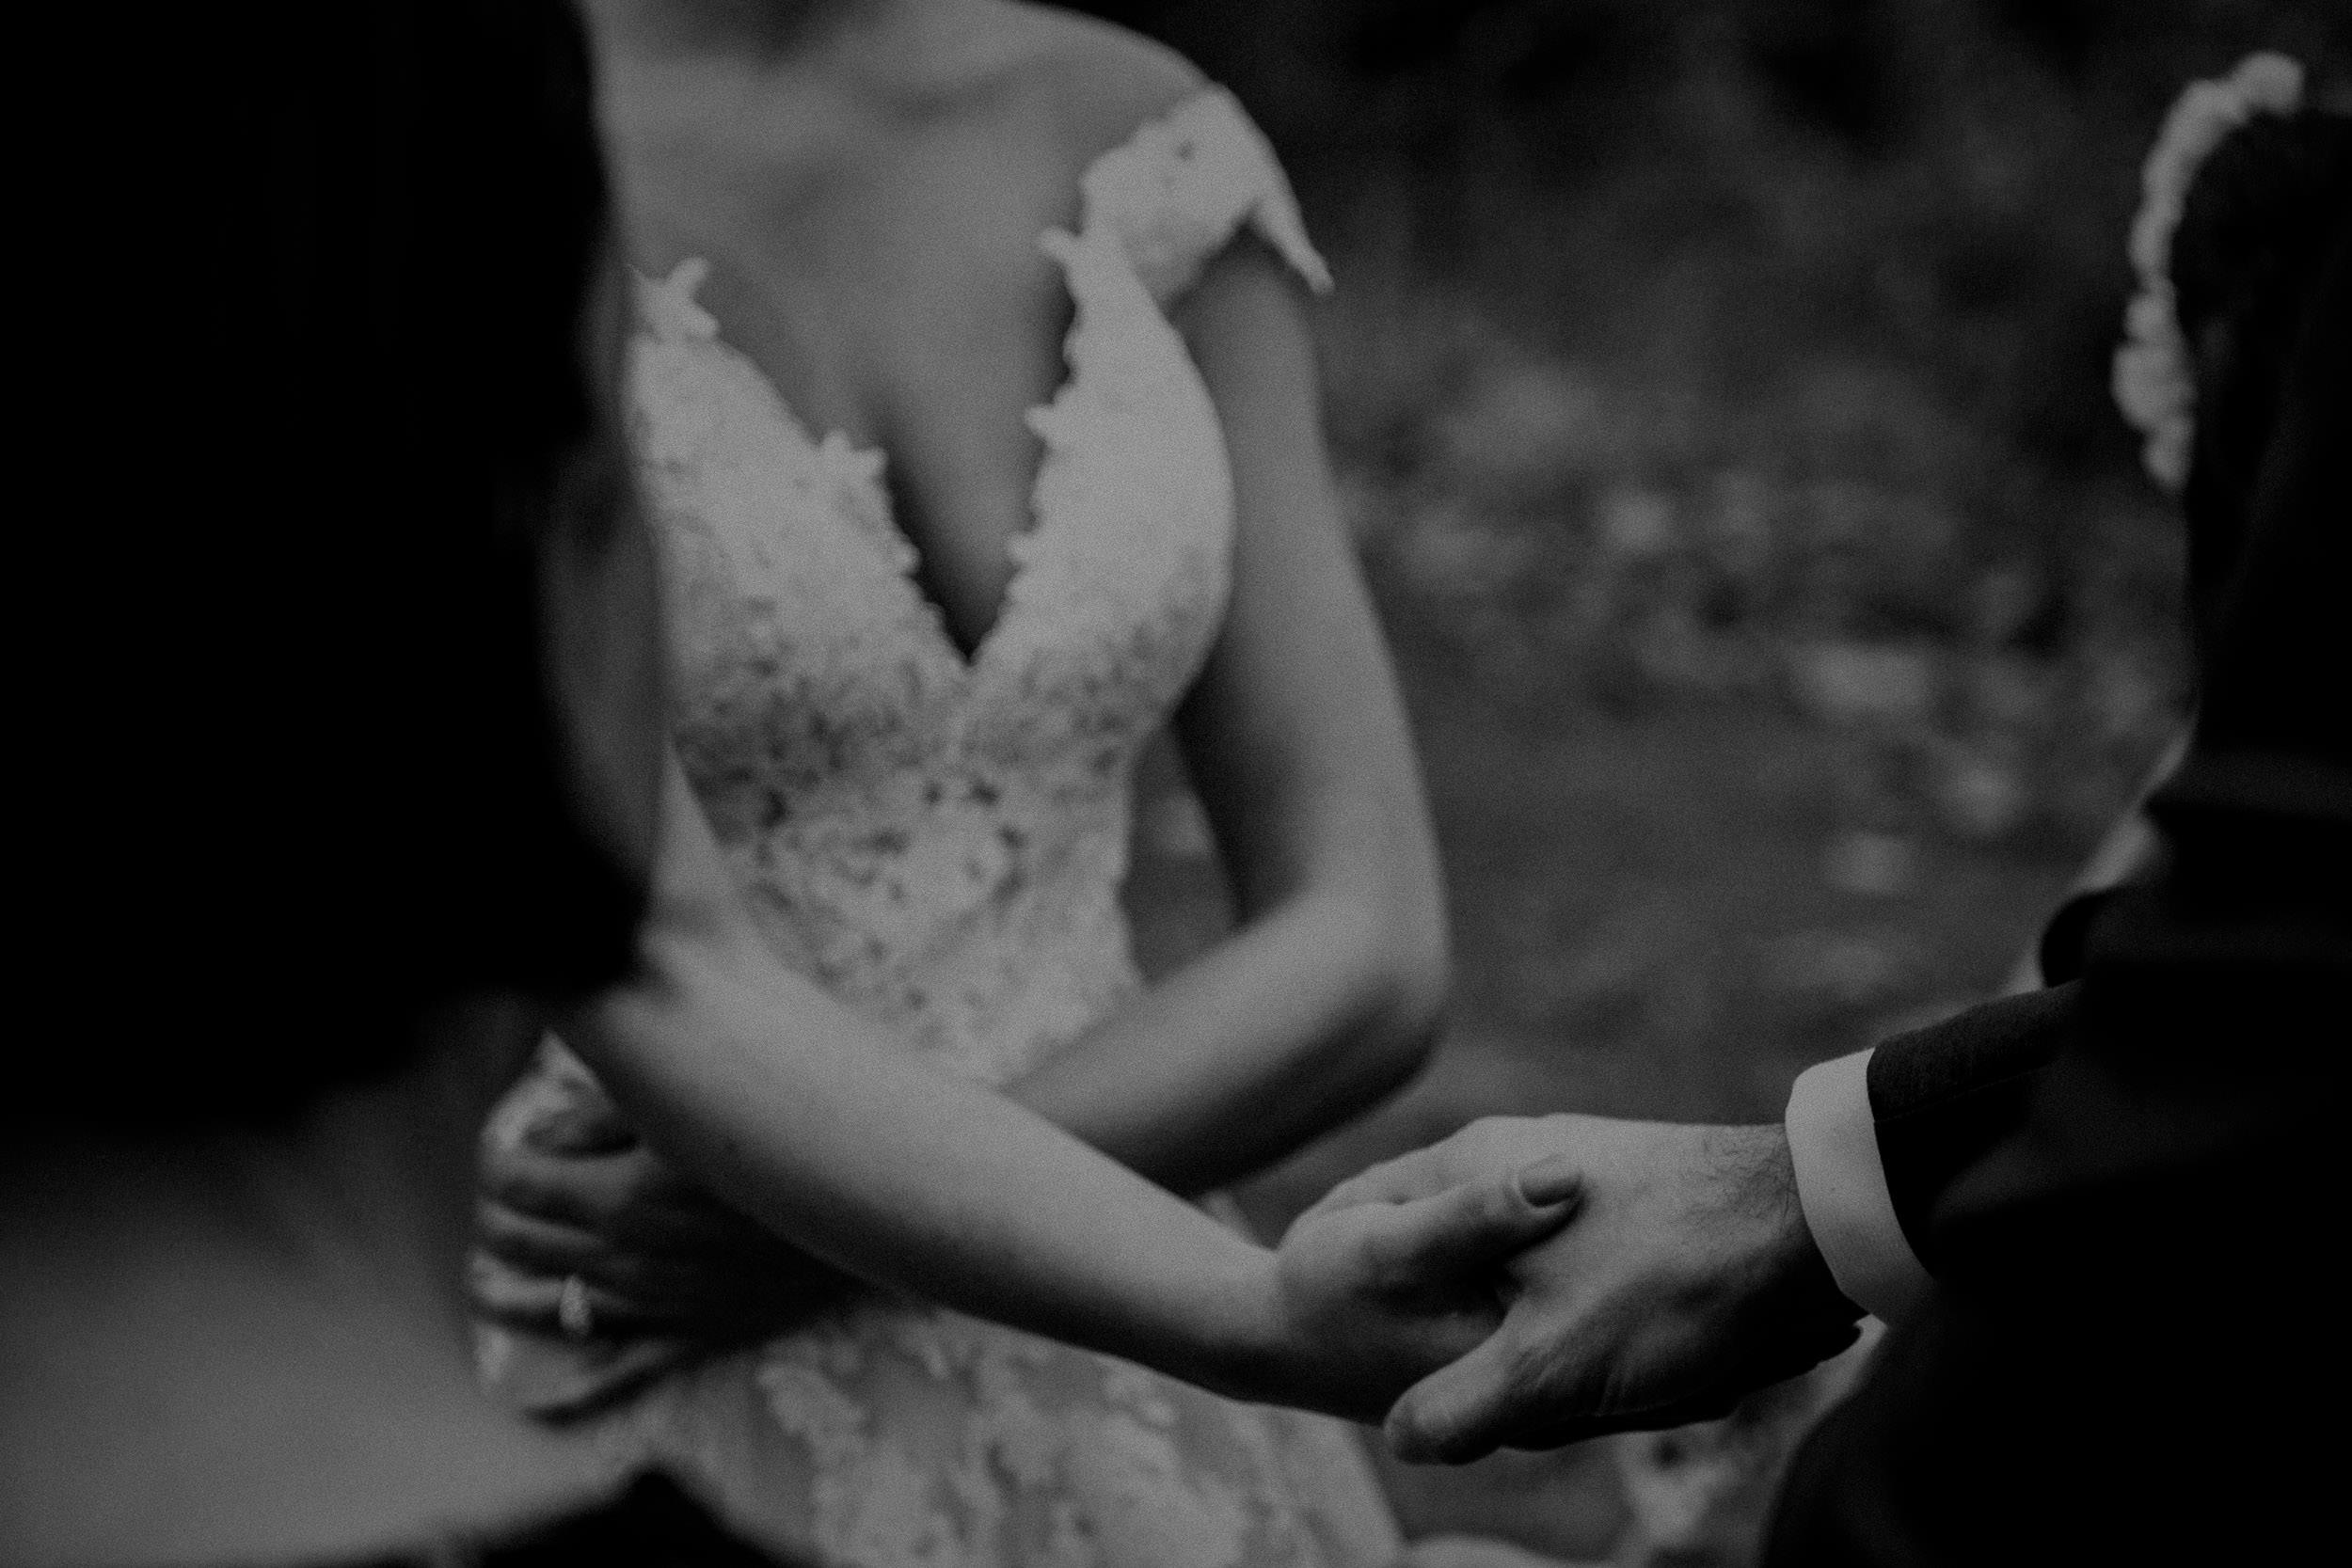 g_c wedding - kings _ thieves elopement wedding photography - blog 29.jpg